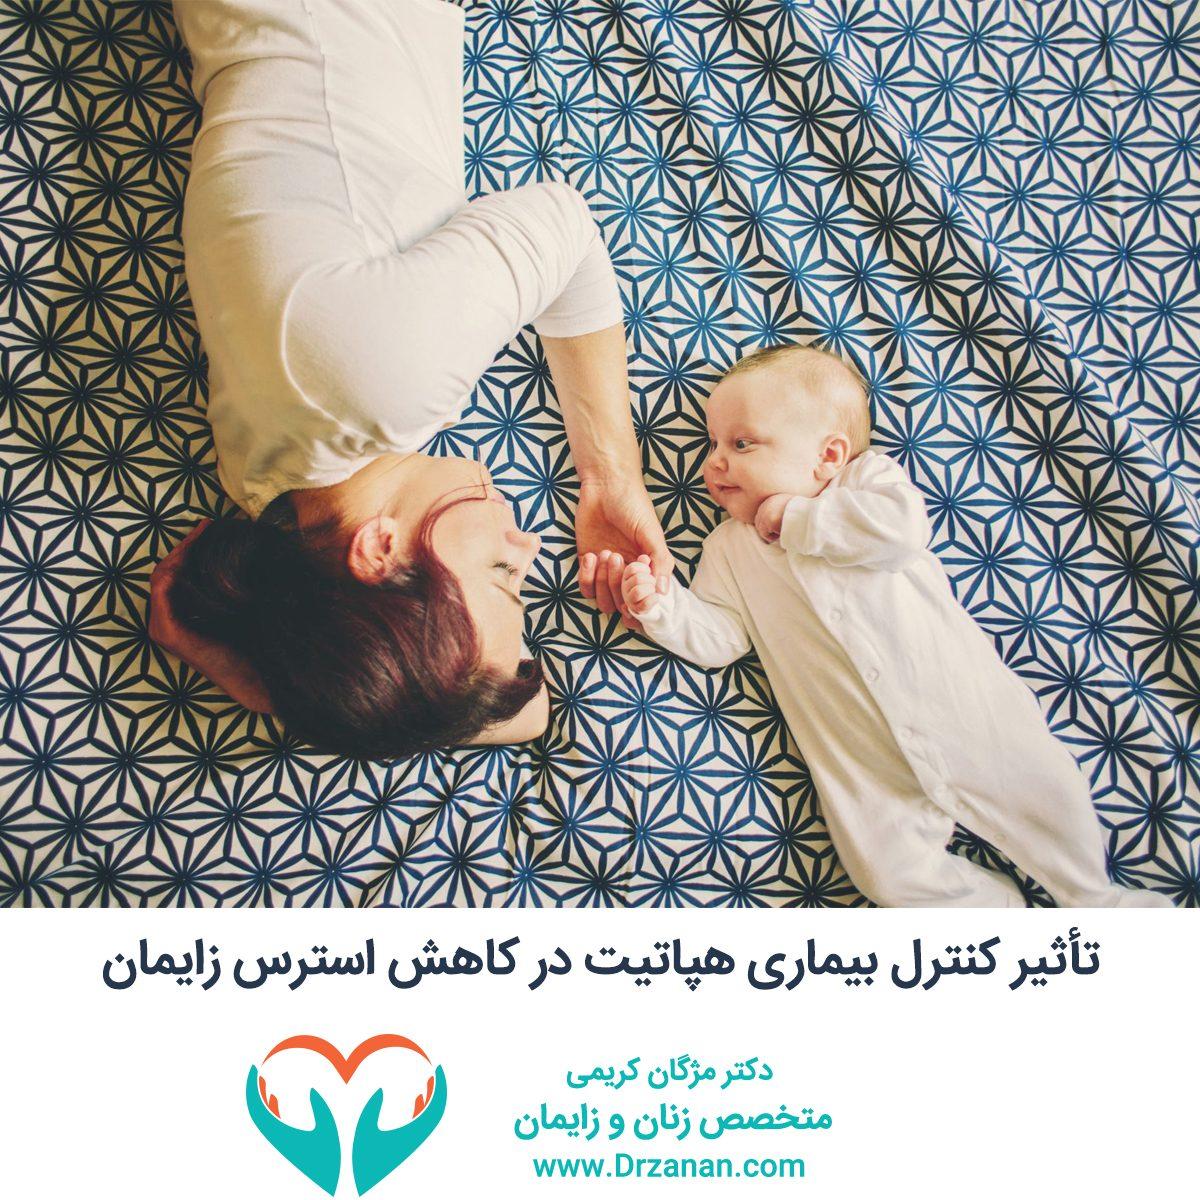 the-effect-of-hepatitis-control-in-reducing-maternal-stress-2-1200x1200.jpg